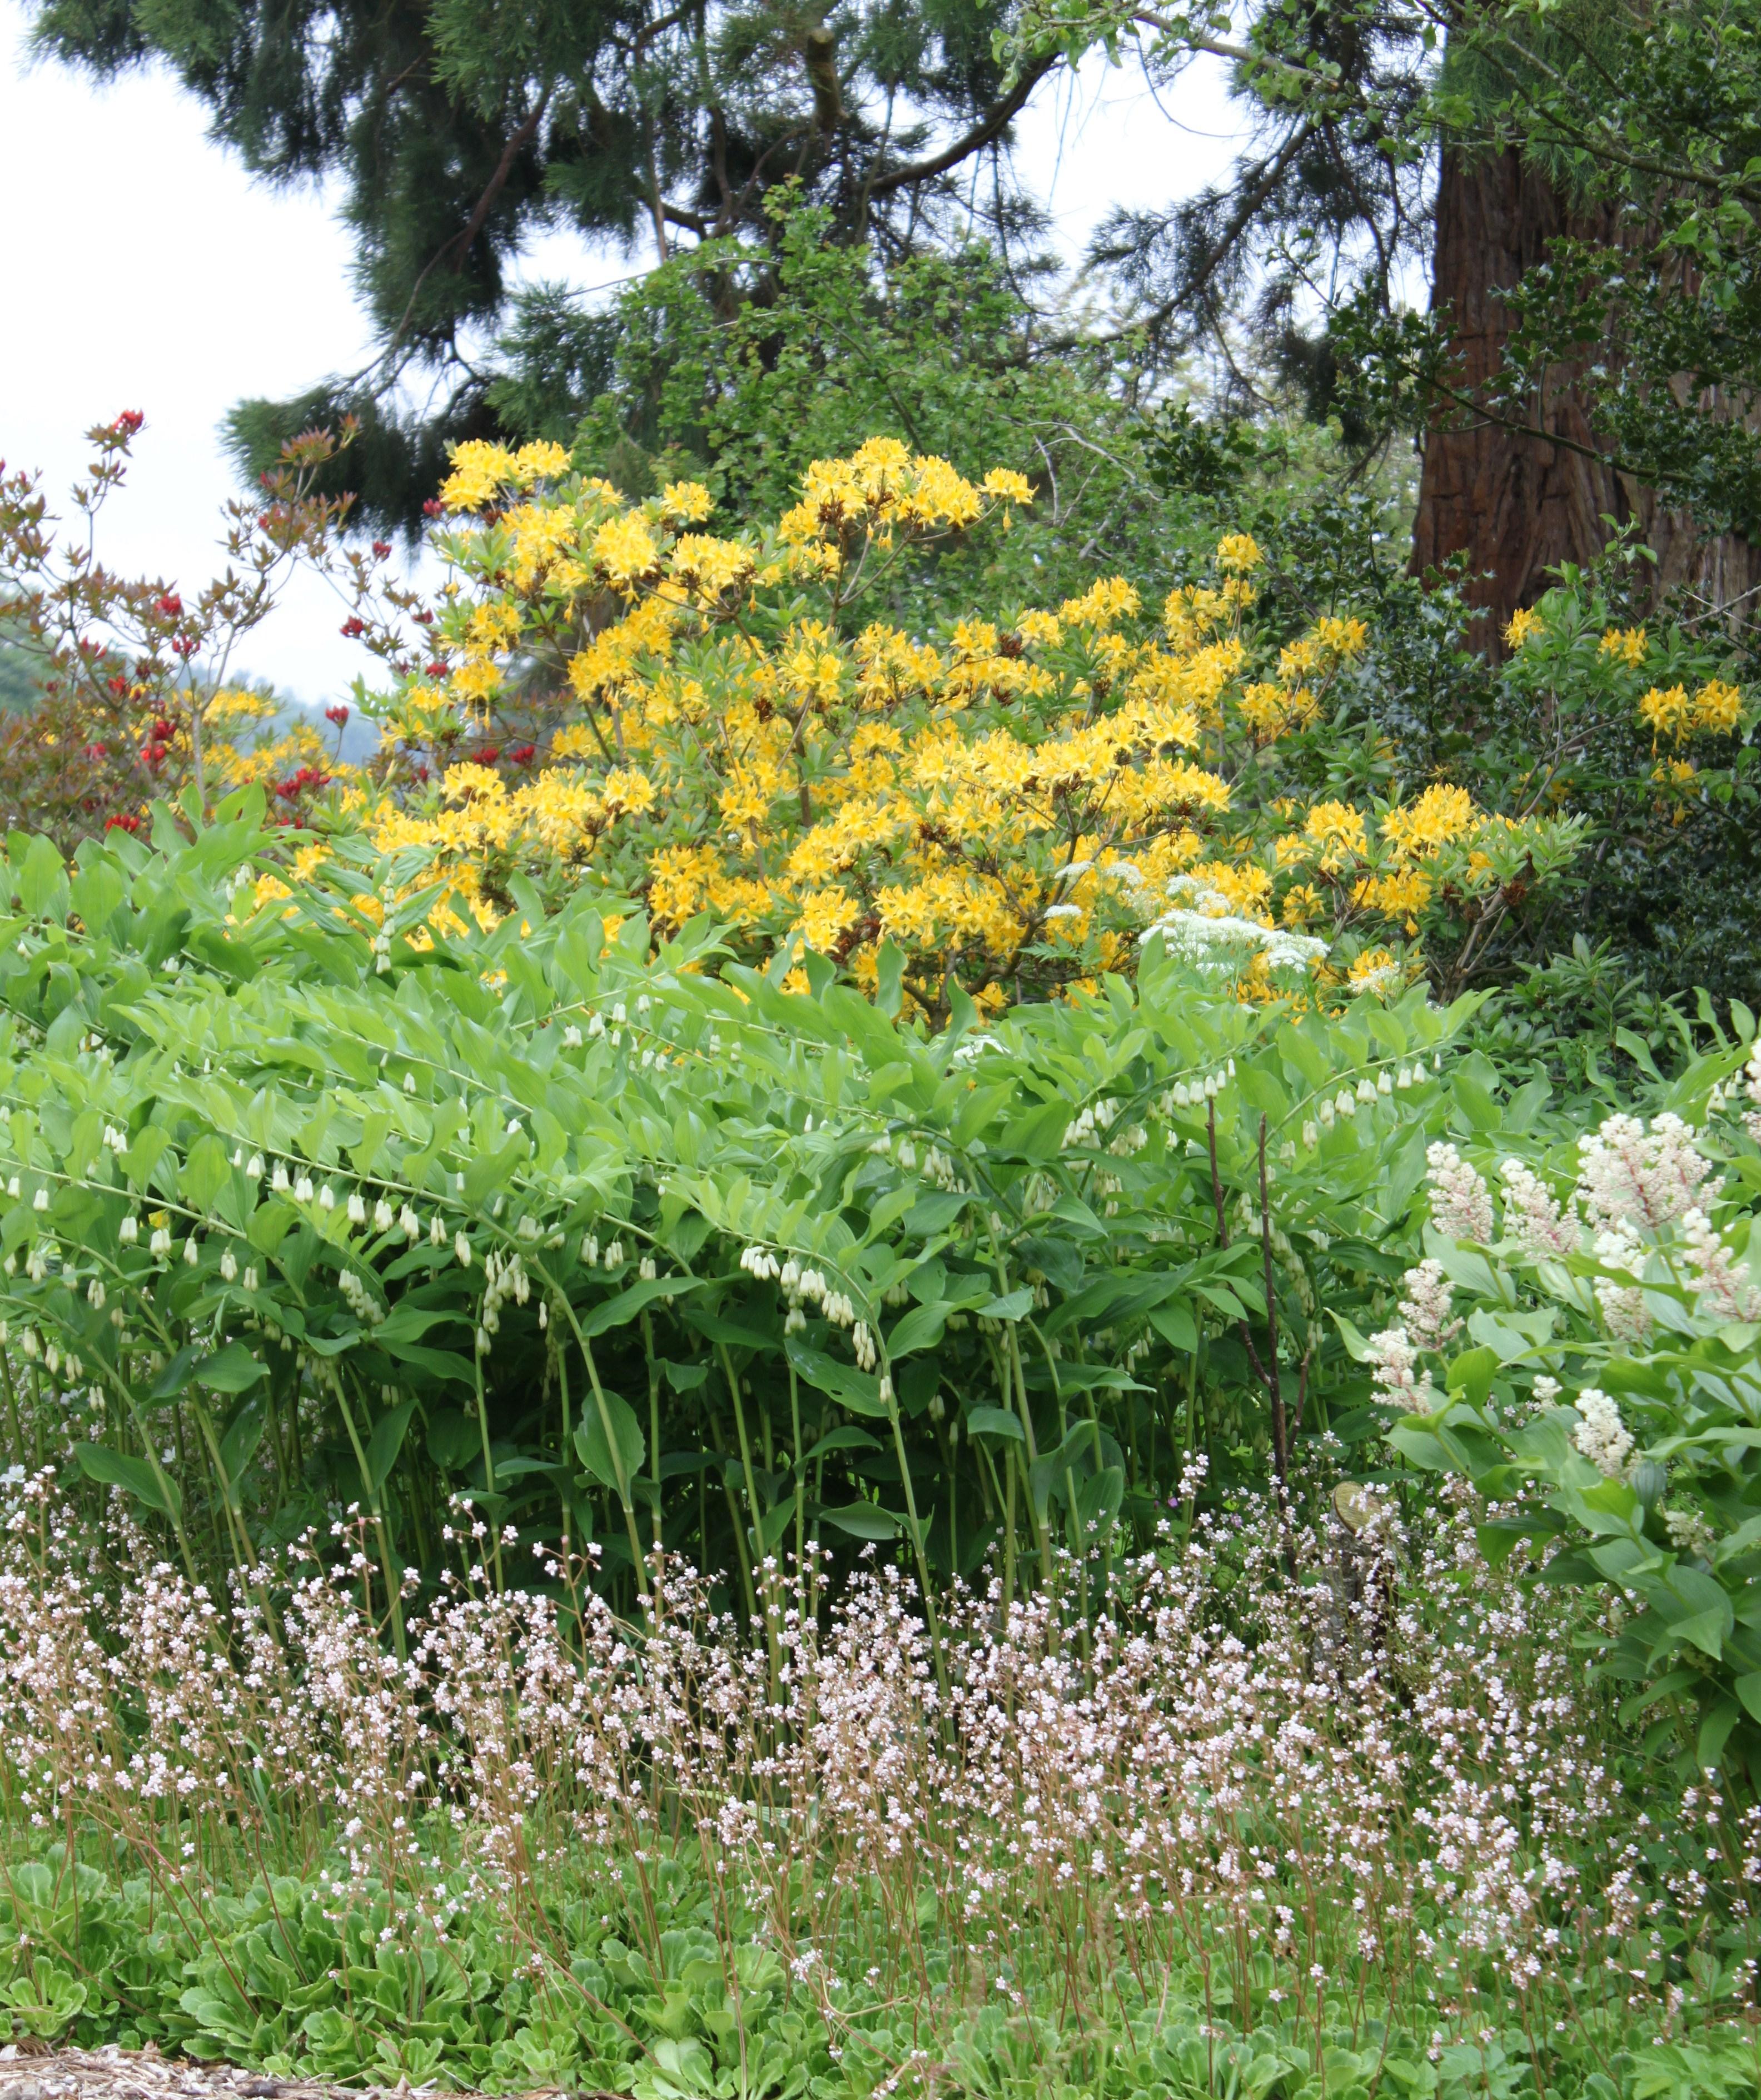 azalea, solomons seal in Logie House Garden for Storytelling Week